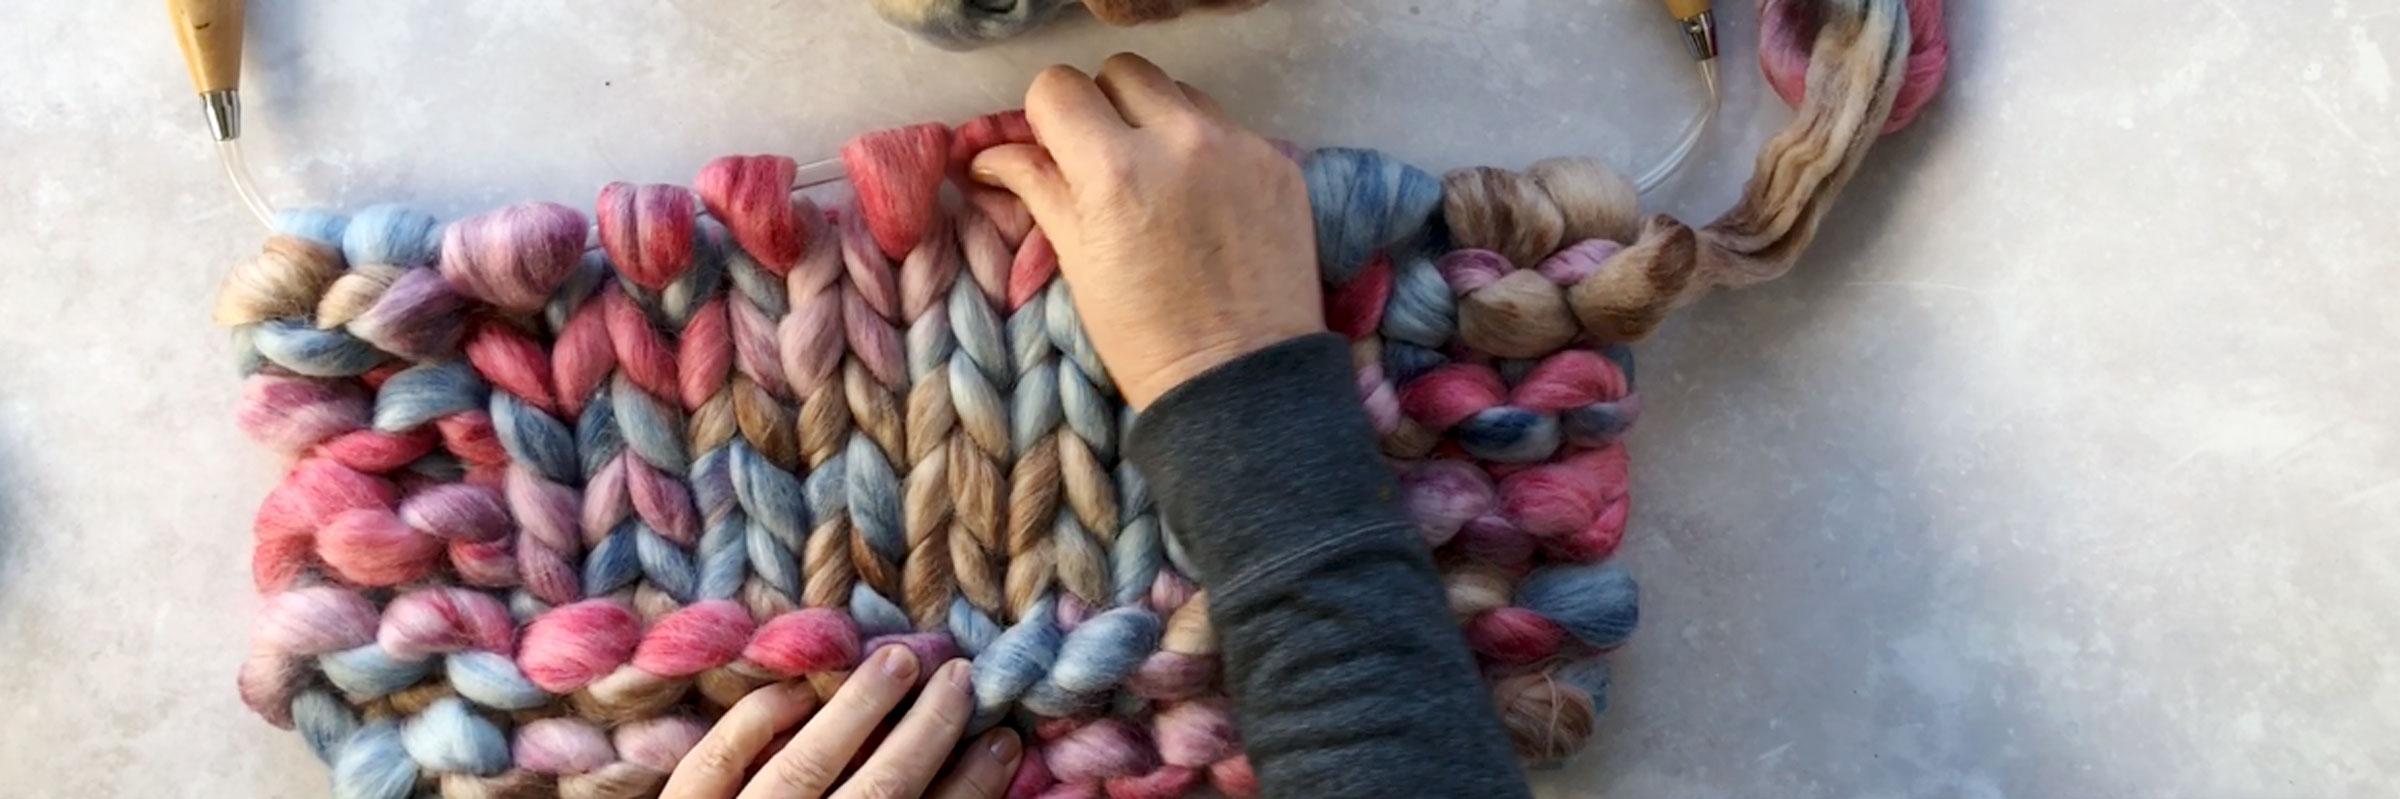 giant.yarn.web1